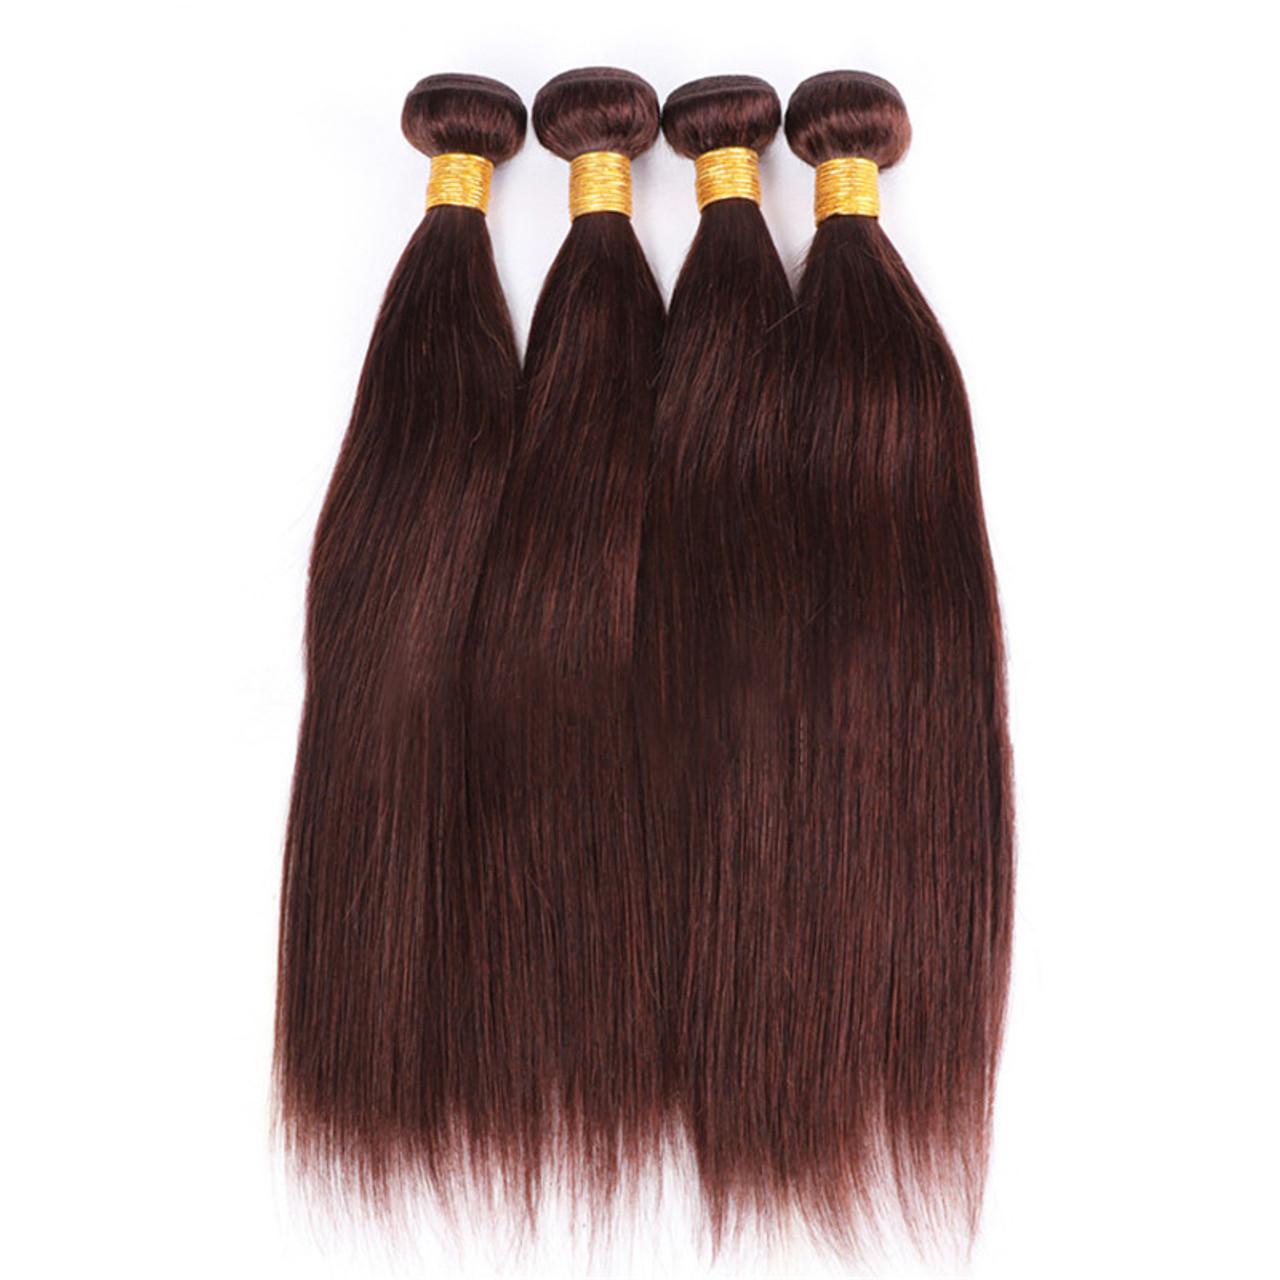 Remeehi Brazilian Virgin Human Hair Weft Straight Ombre Hair